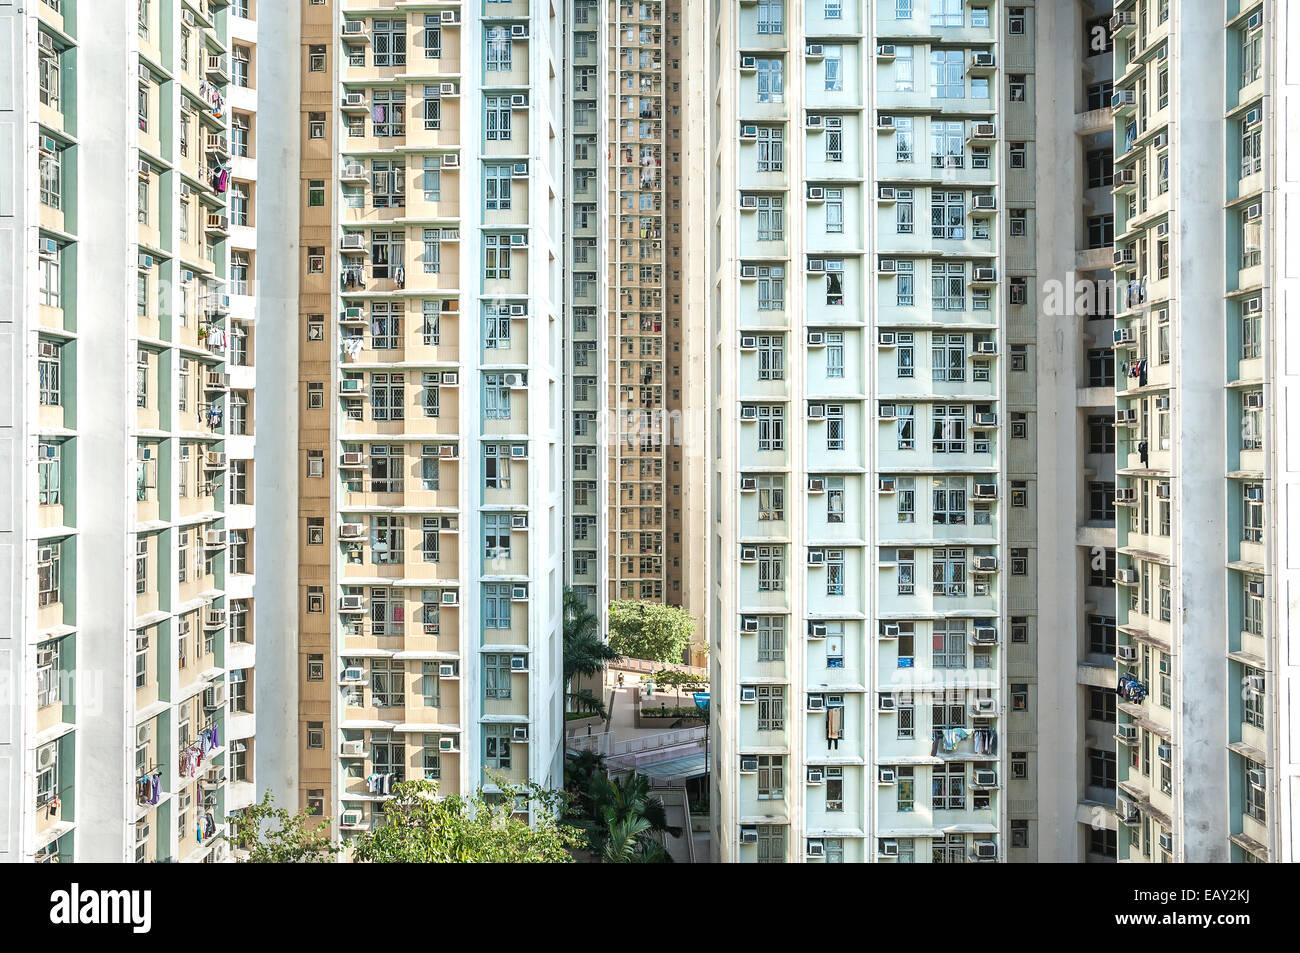 High-density public housing estate, Hong Kong - Stock Image